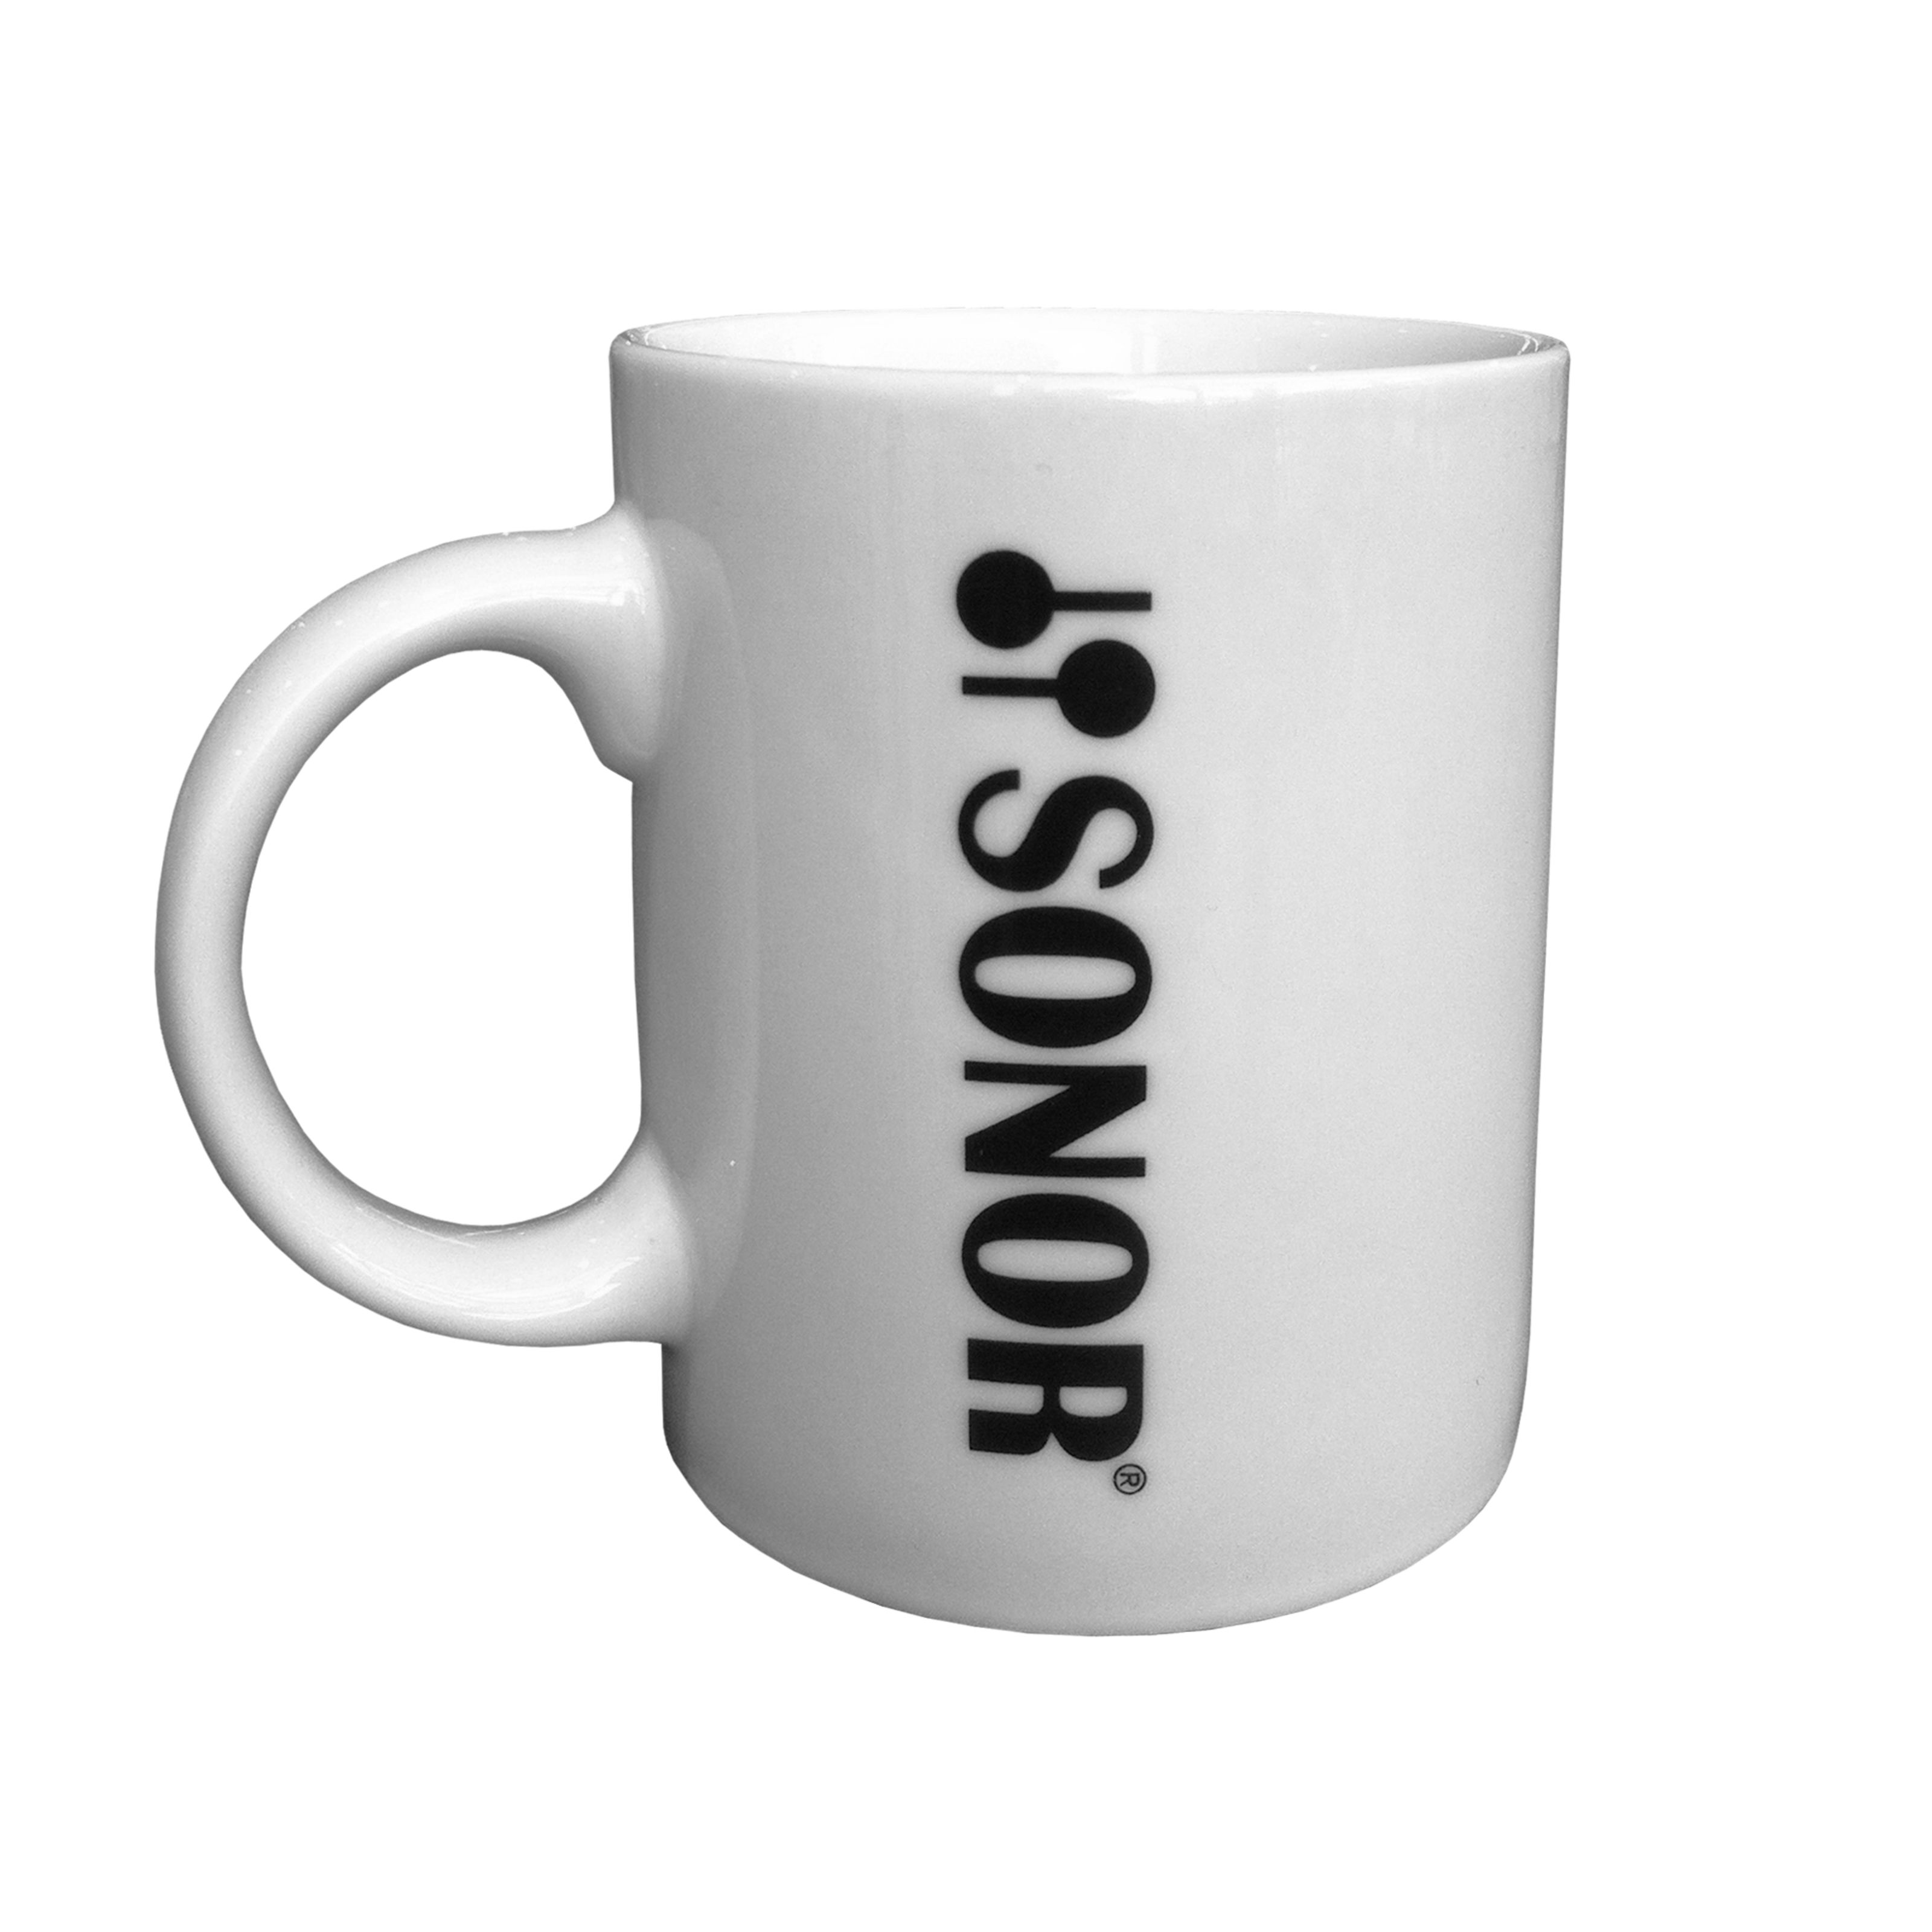 Sonor - Kaffeetasse, white